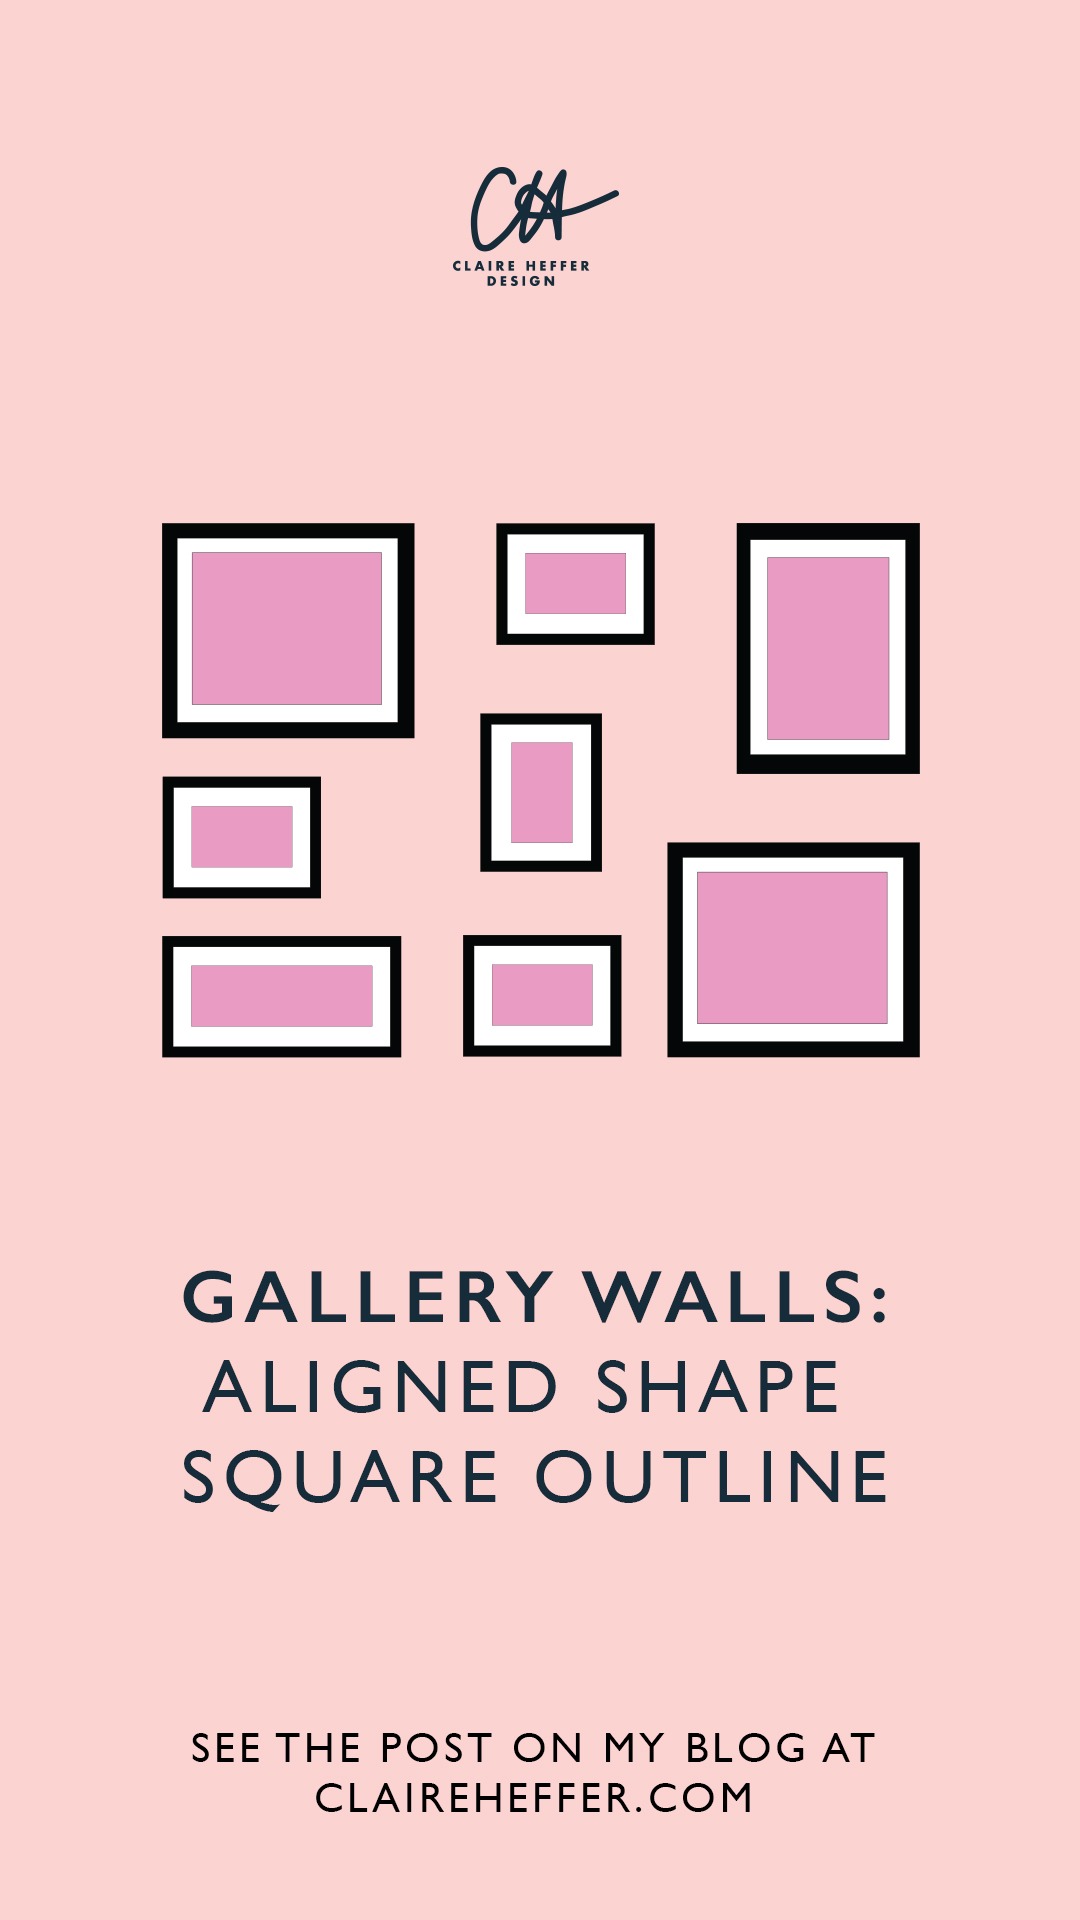 GALLERY WALLS ALIGNED SHAPE SQUARE OUTLINE.jpg